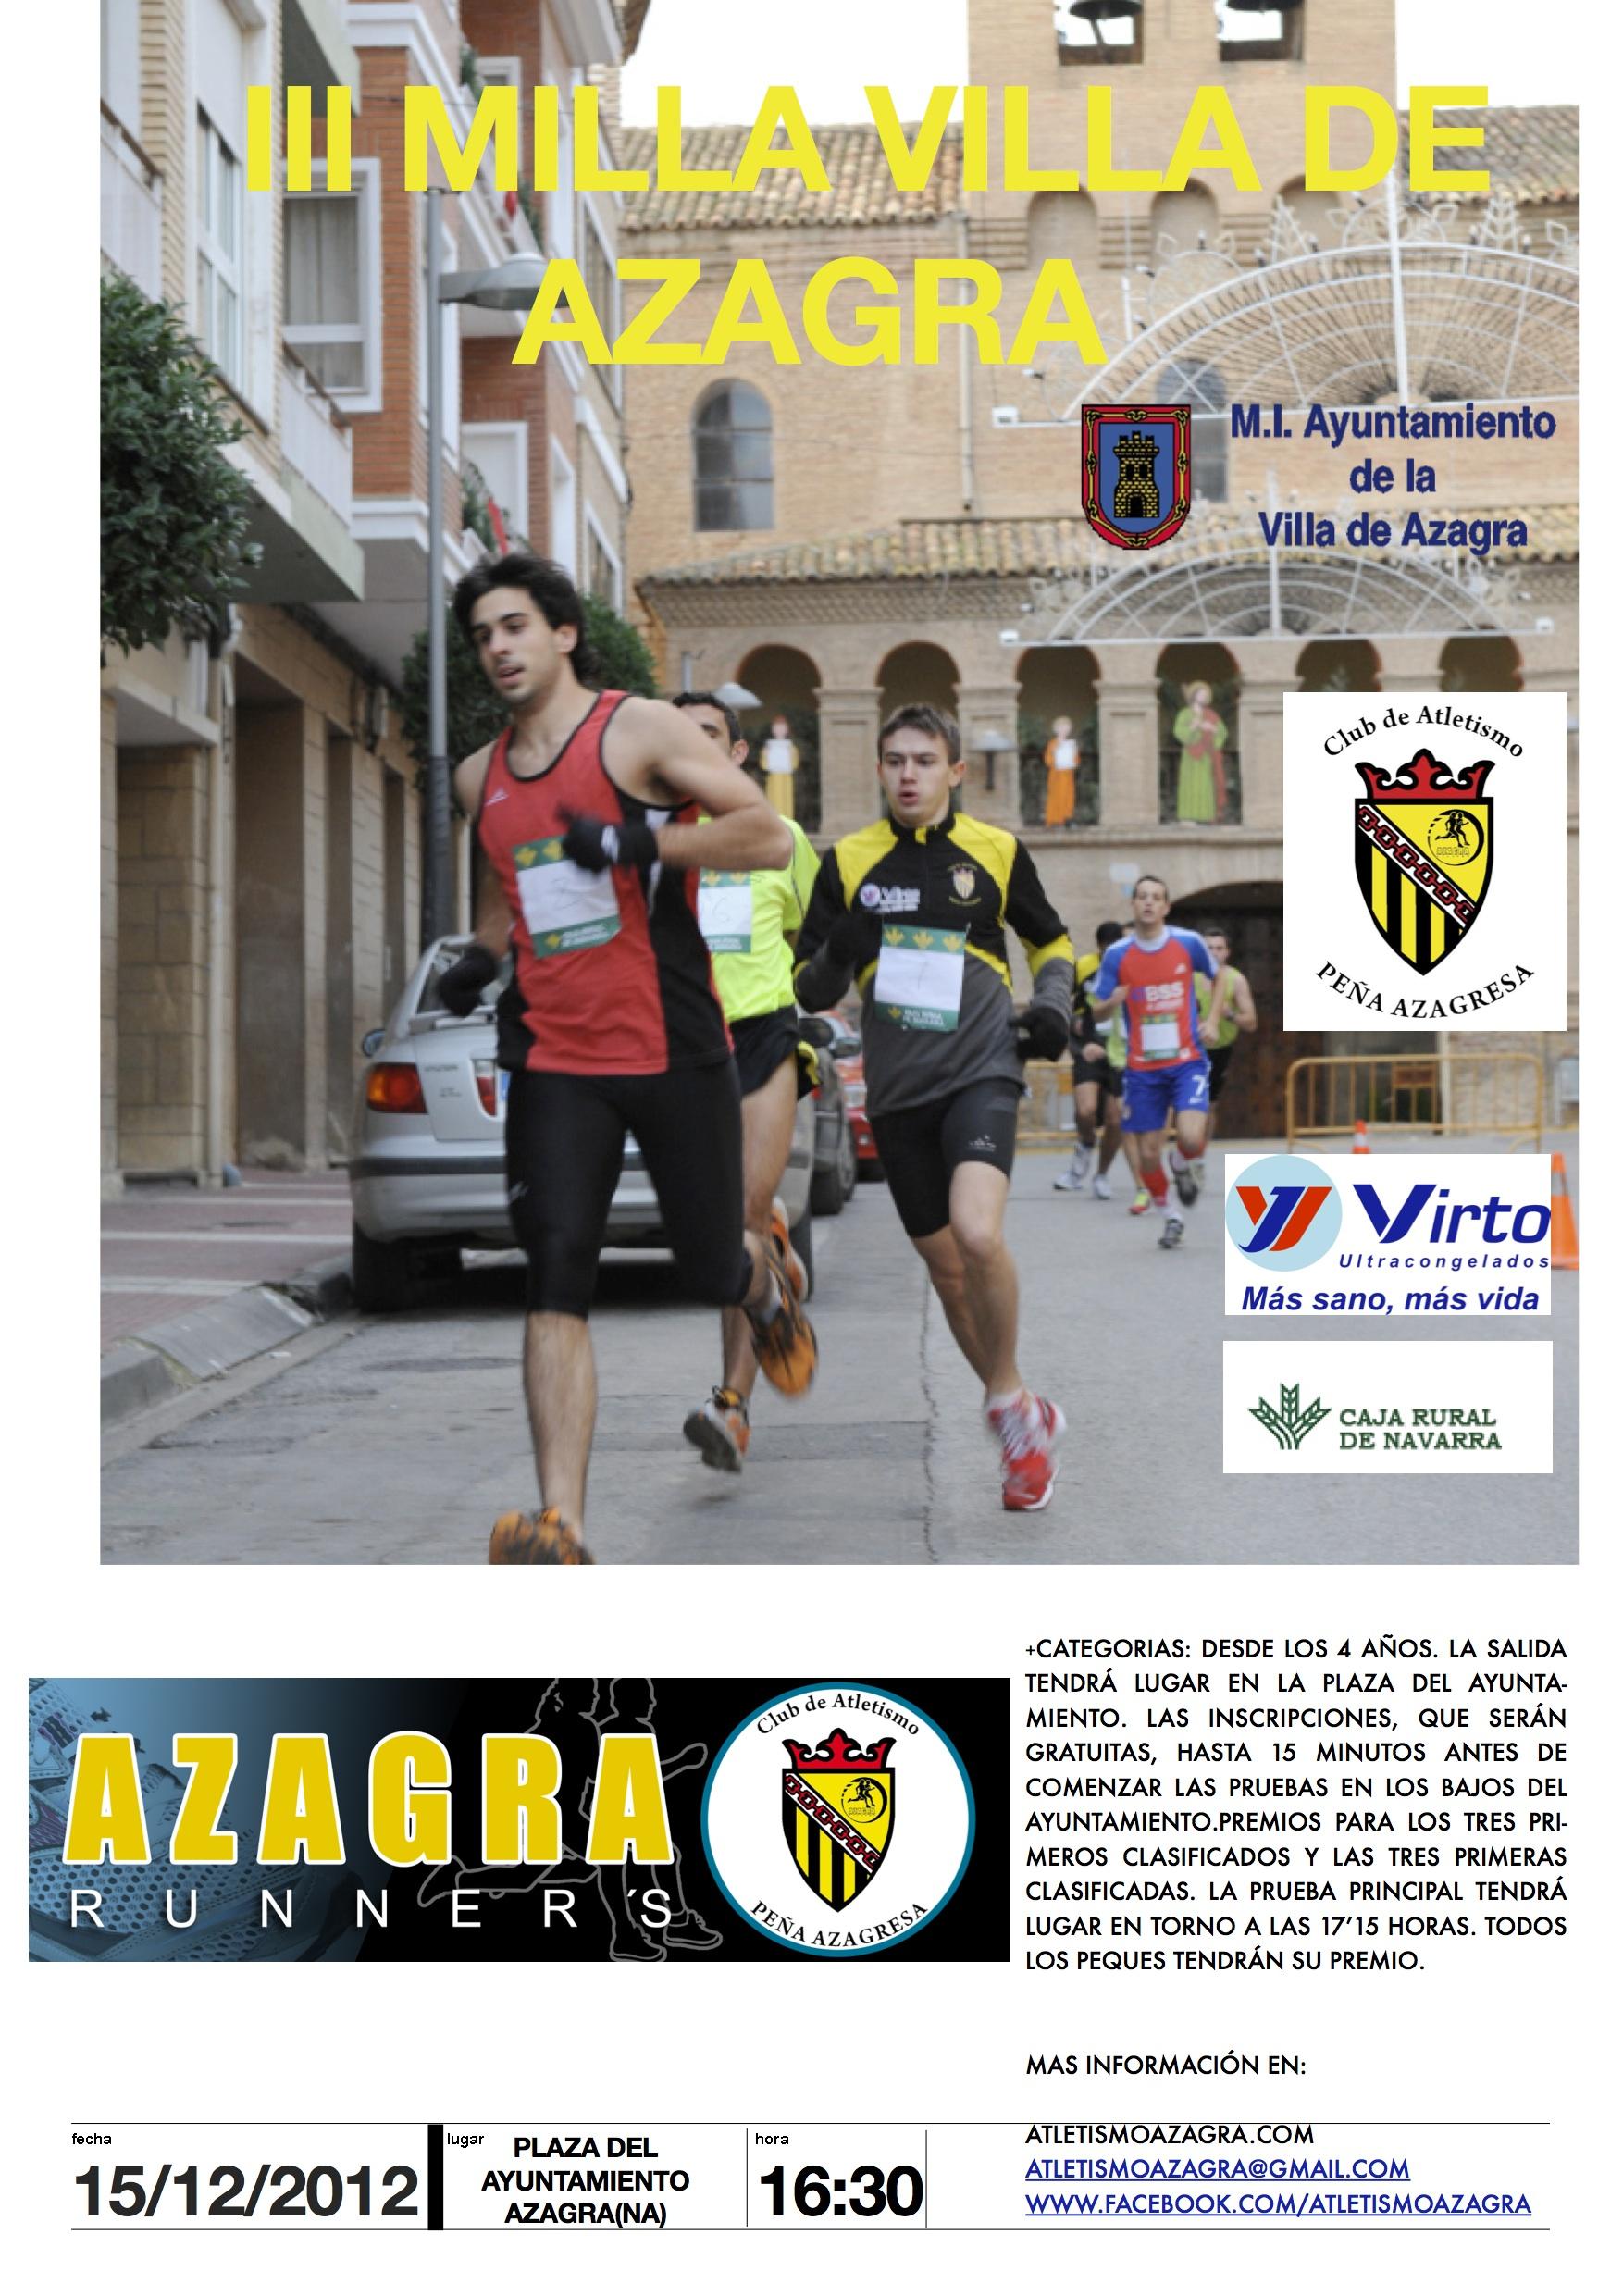 Iv Milla Villa De Azagra Club Atletismo Pe A Azagresa